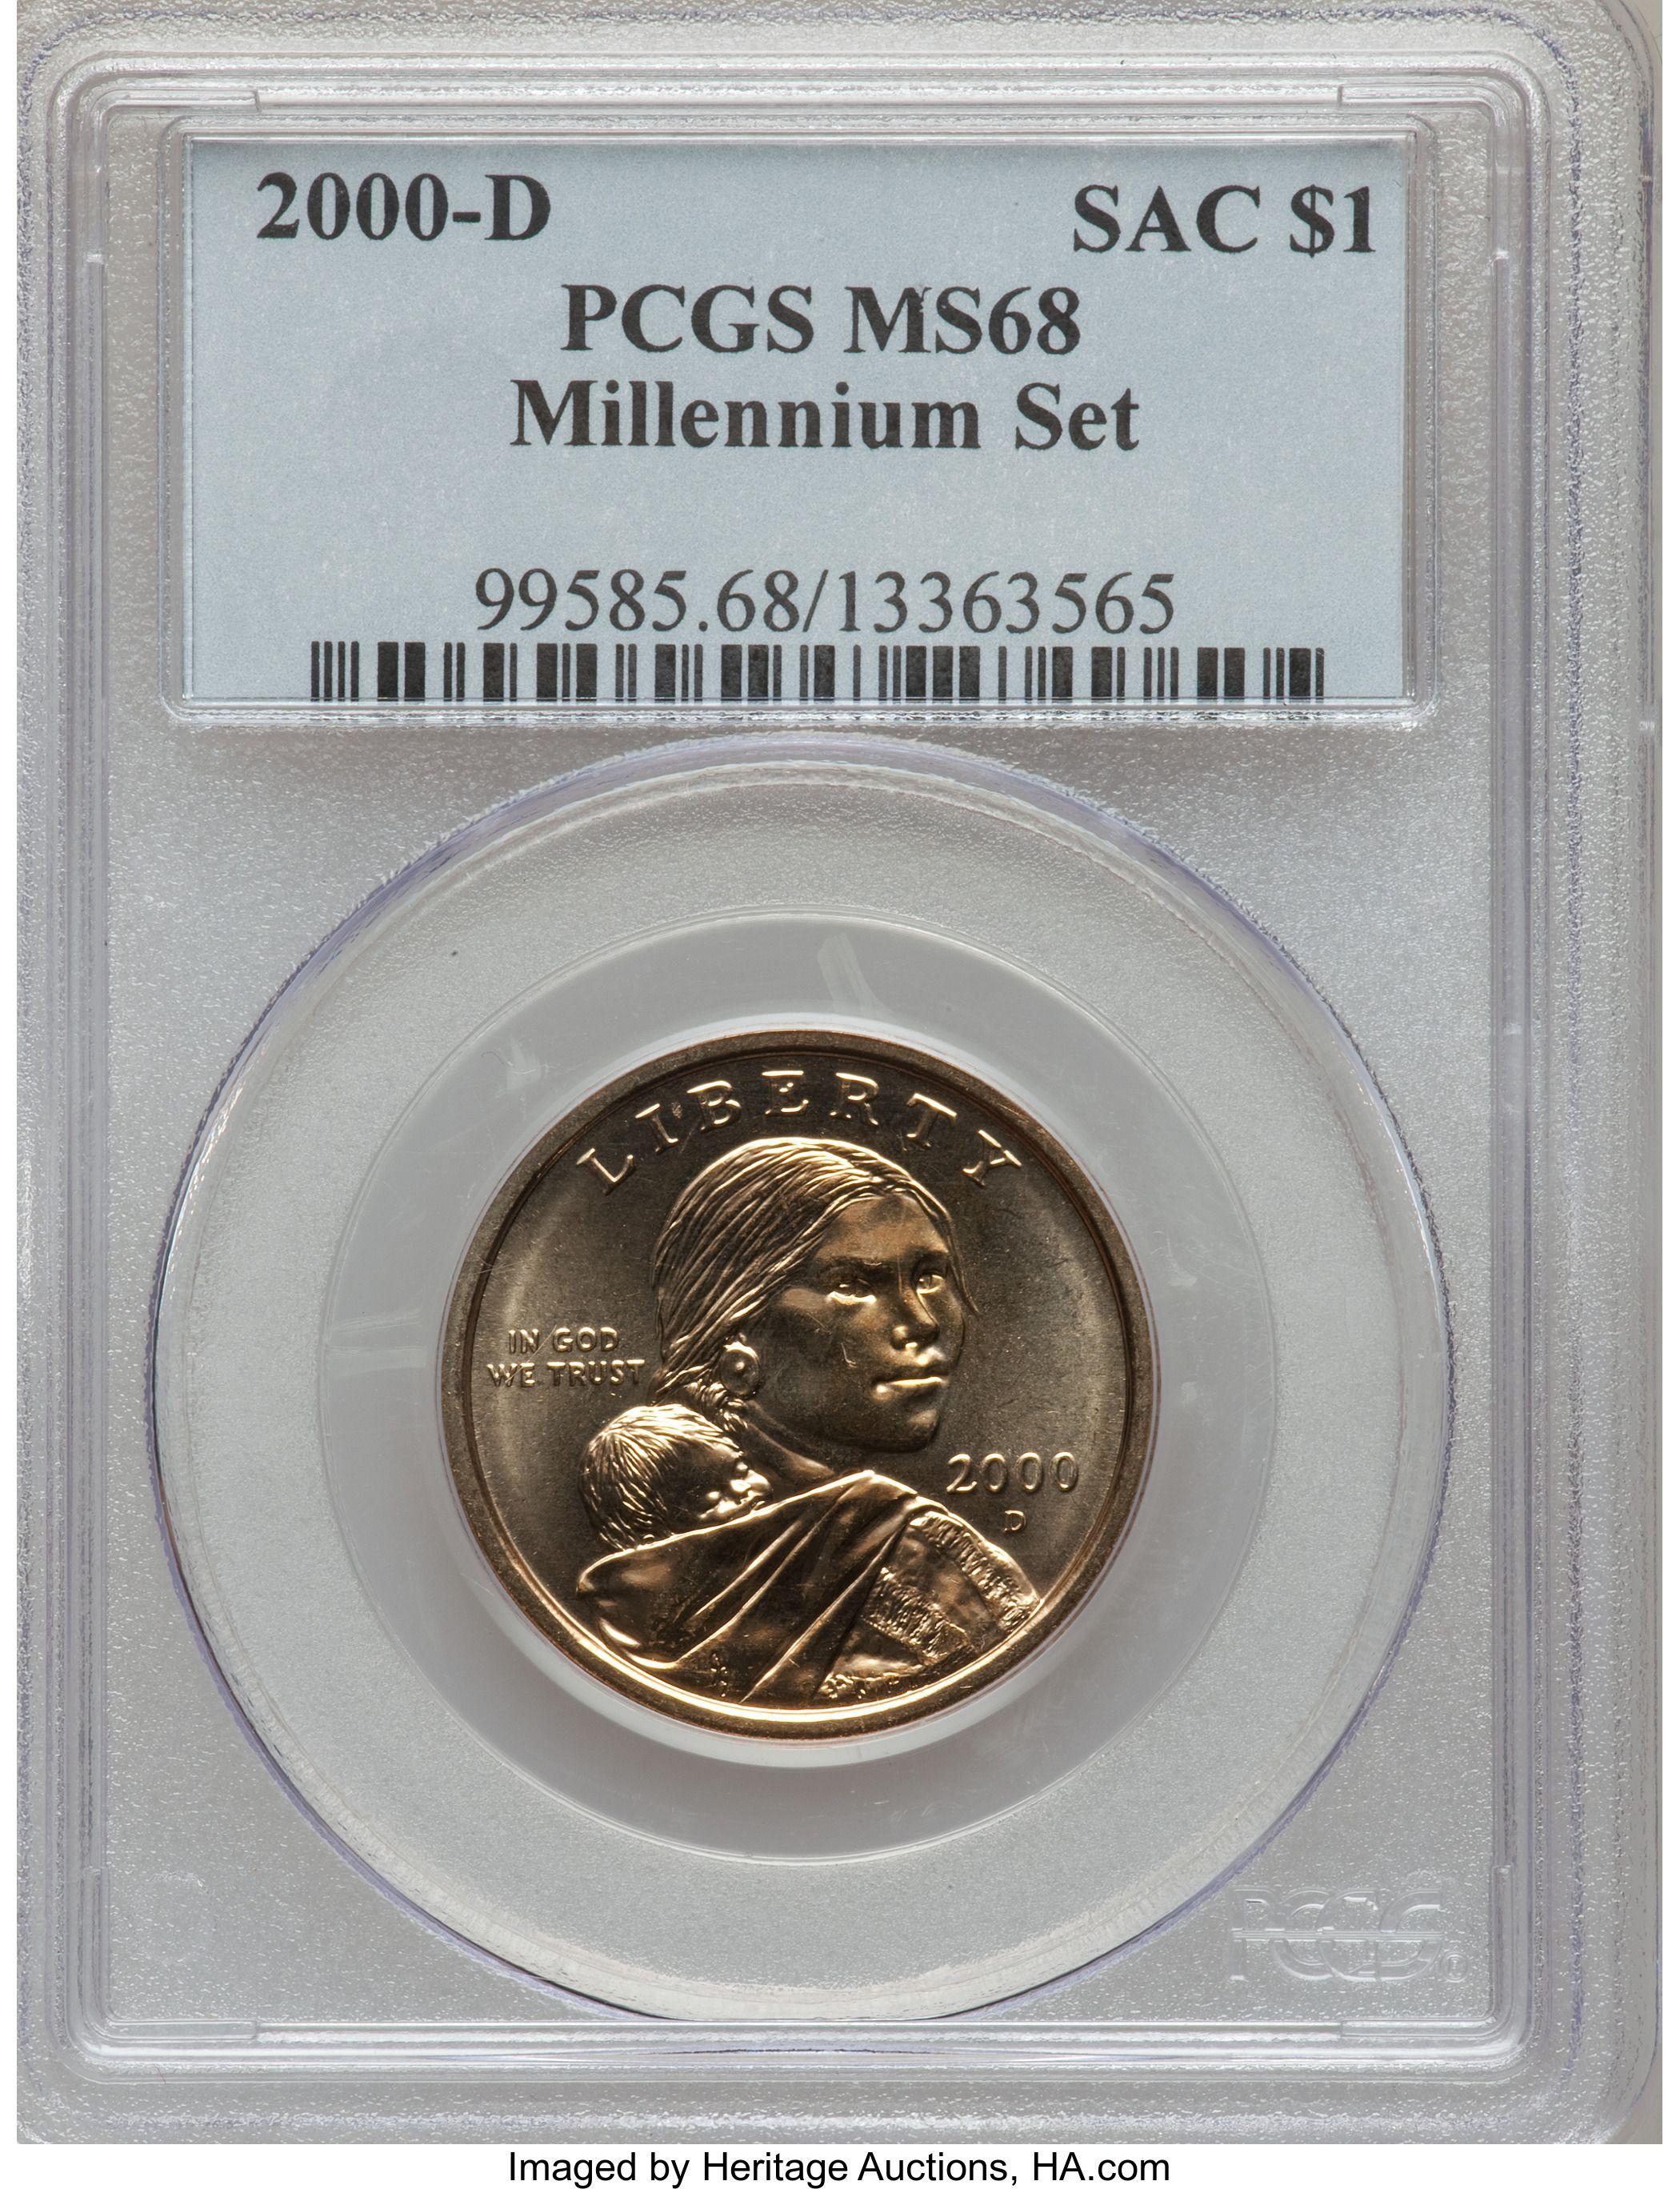 2000 D Millennium Set Sacagawea Dollar Value Coin Helpu Sacagawea Dollar Sacagawea American Dollar